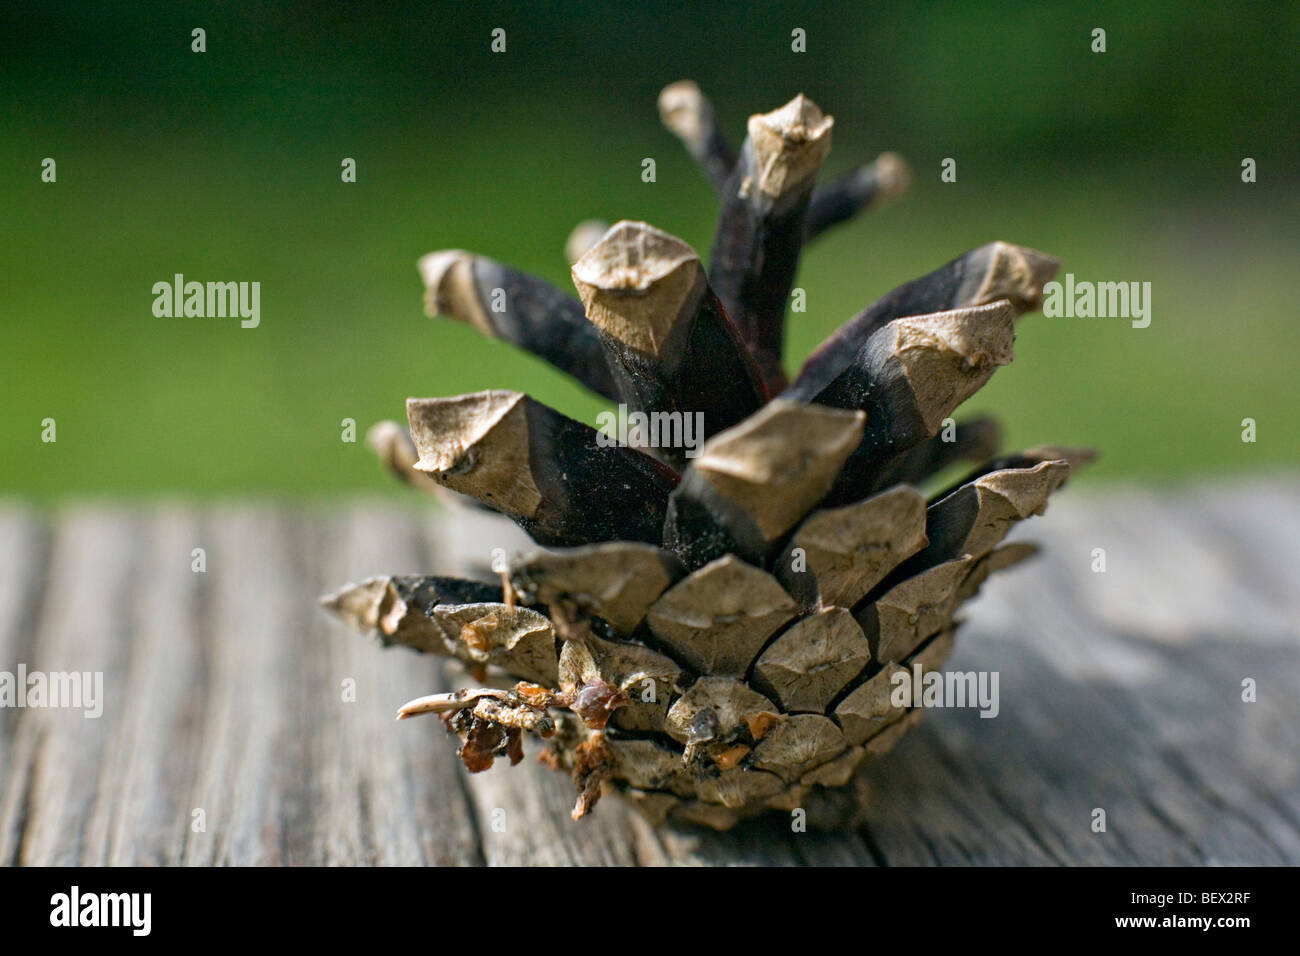 Female conifer cone in close-up - Stock Image